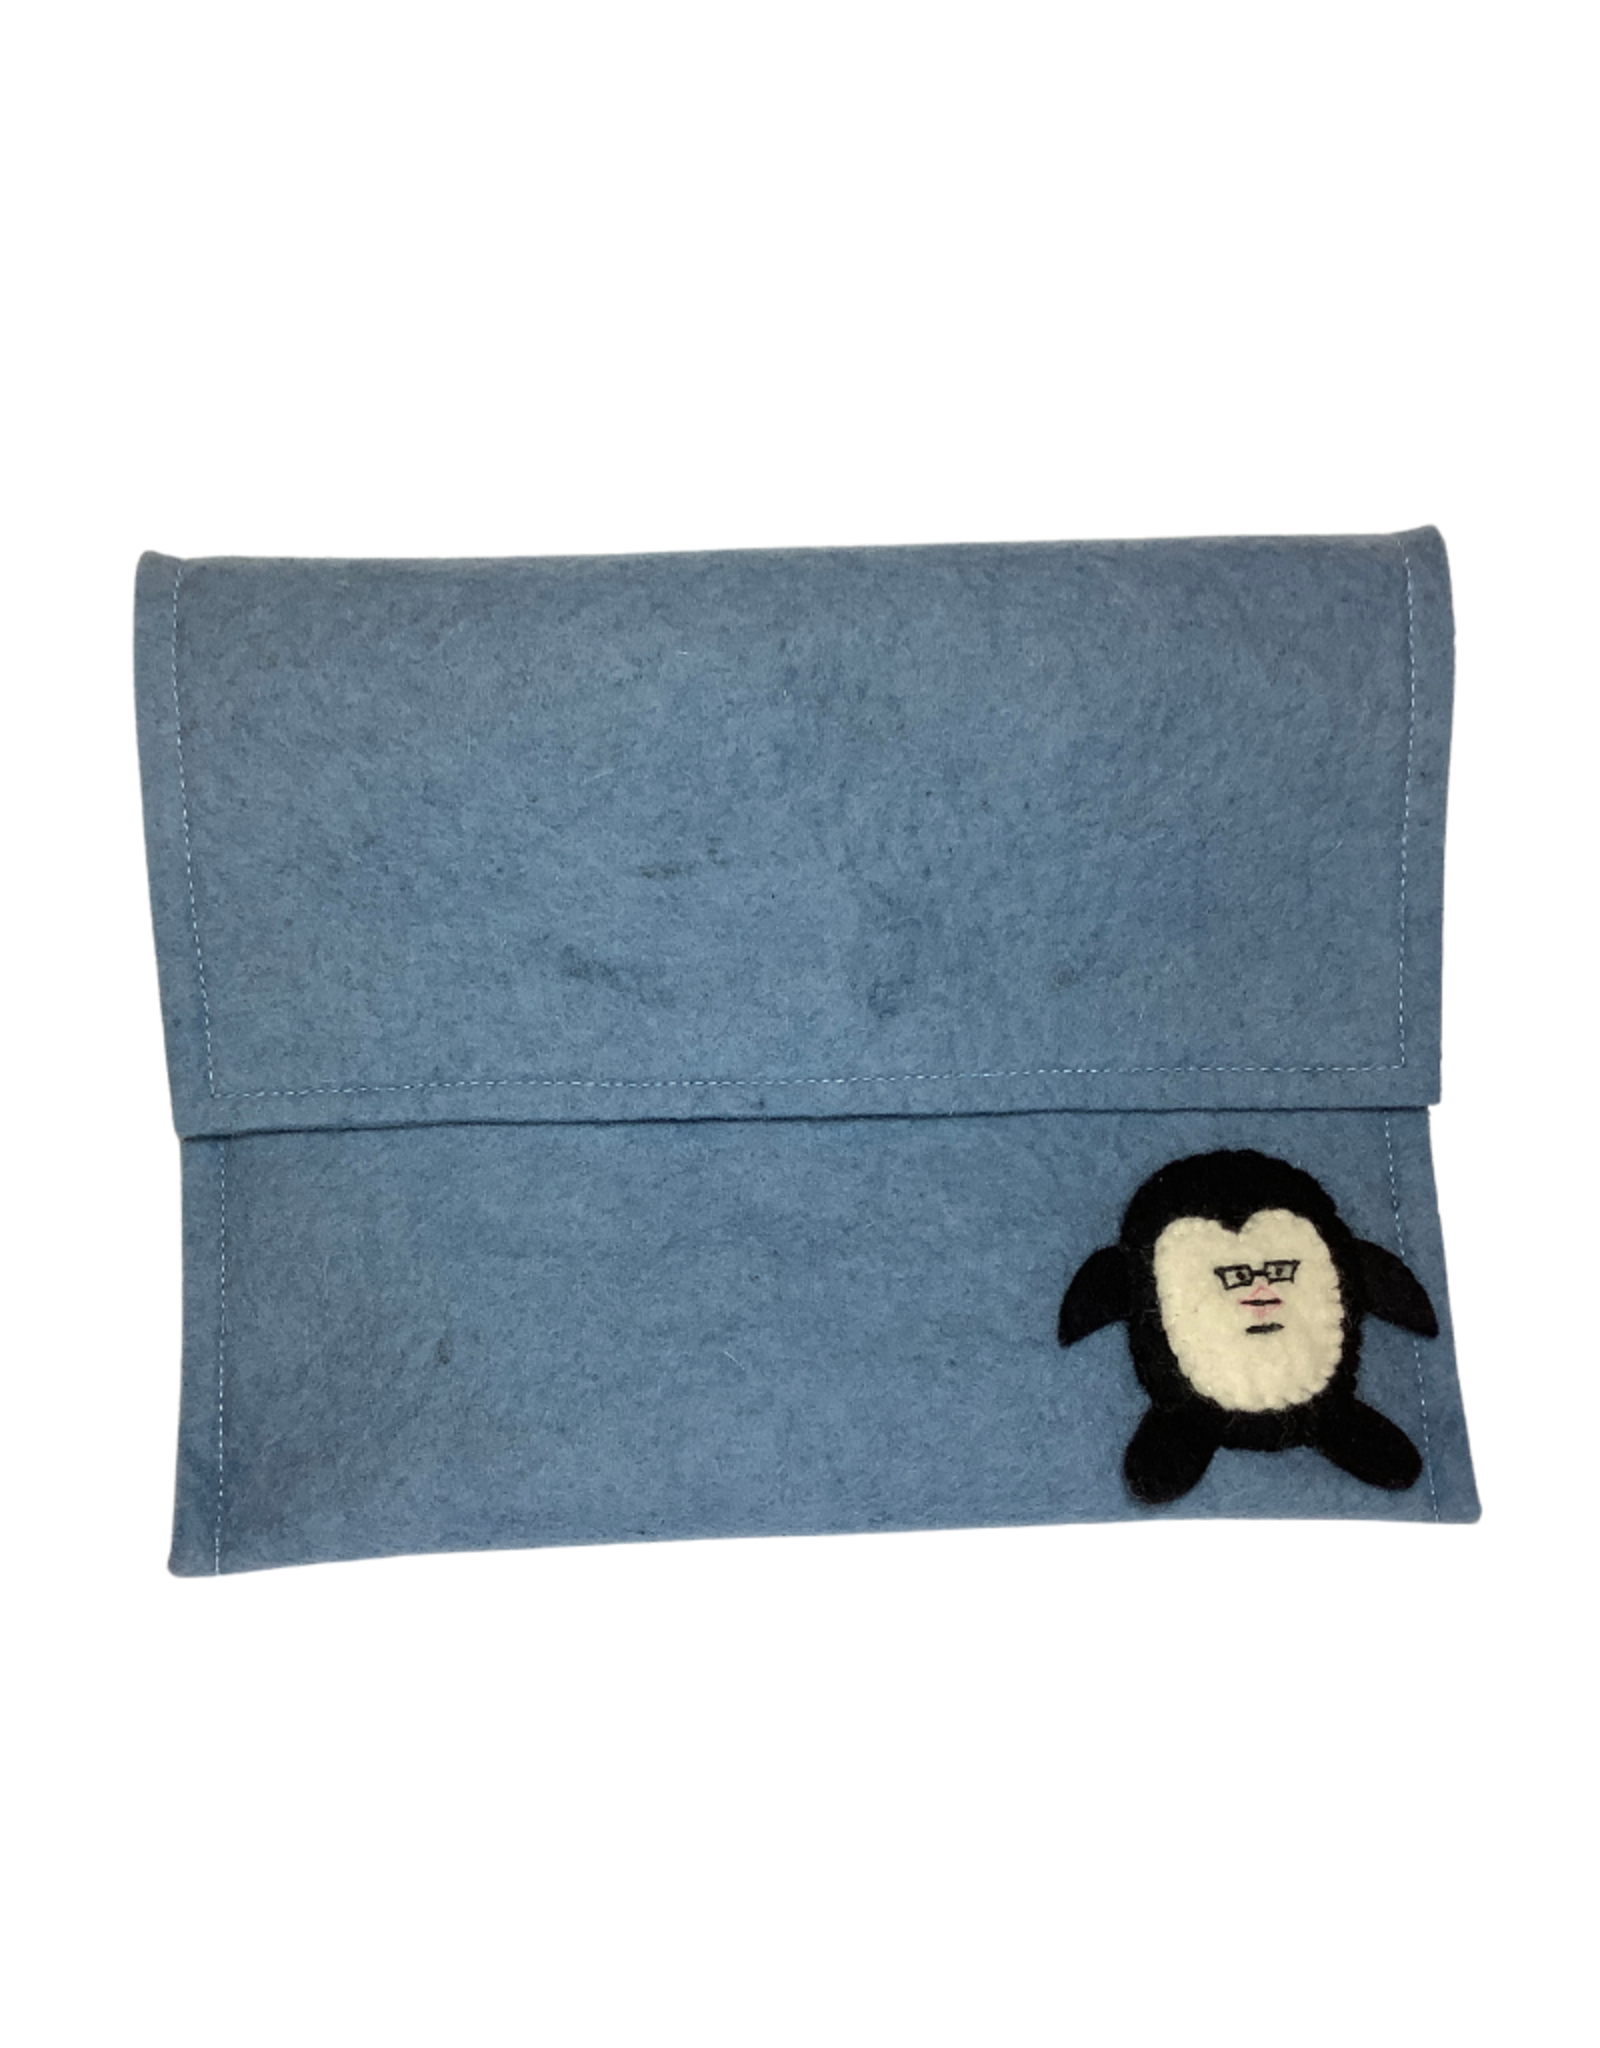 Tablet Bag, blue felt